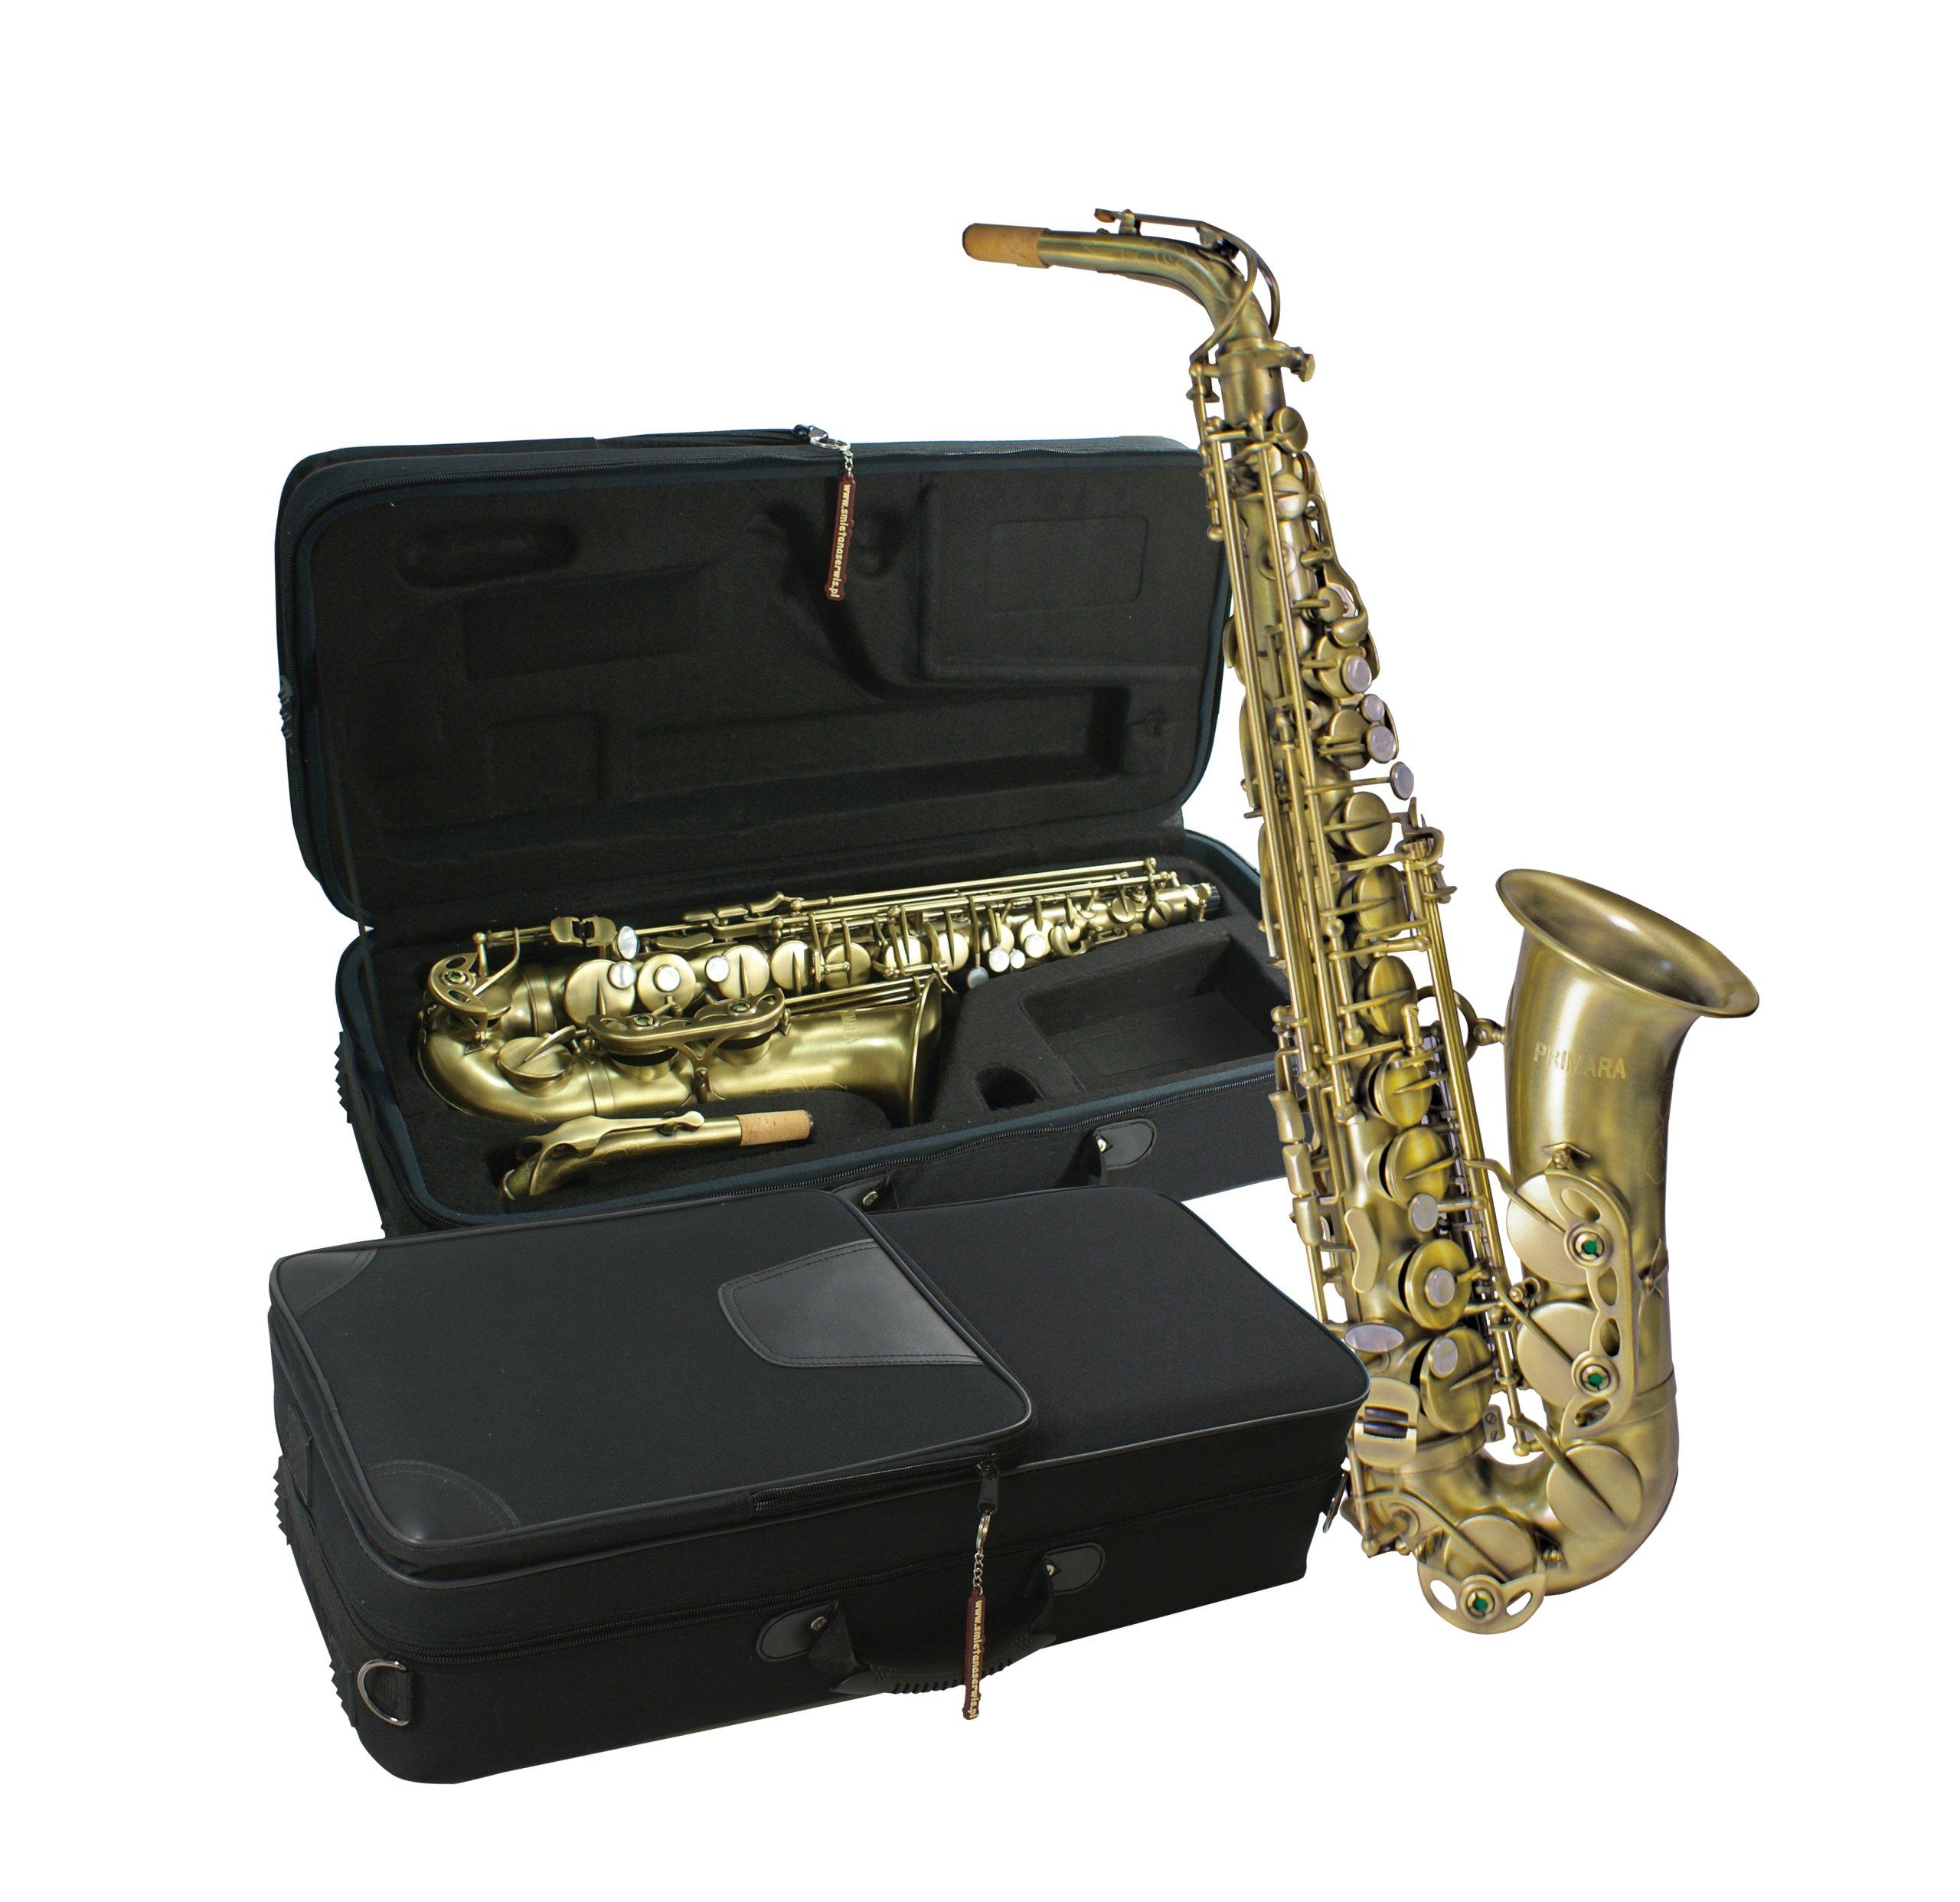 Alto saxofón Vintage Primara